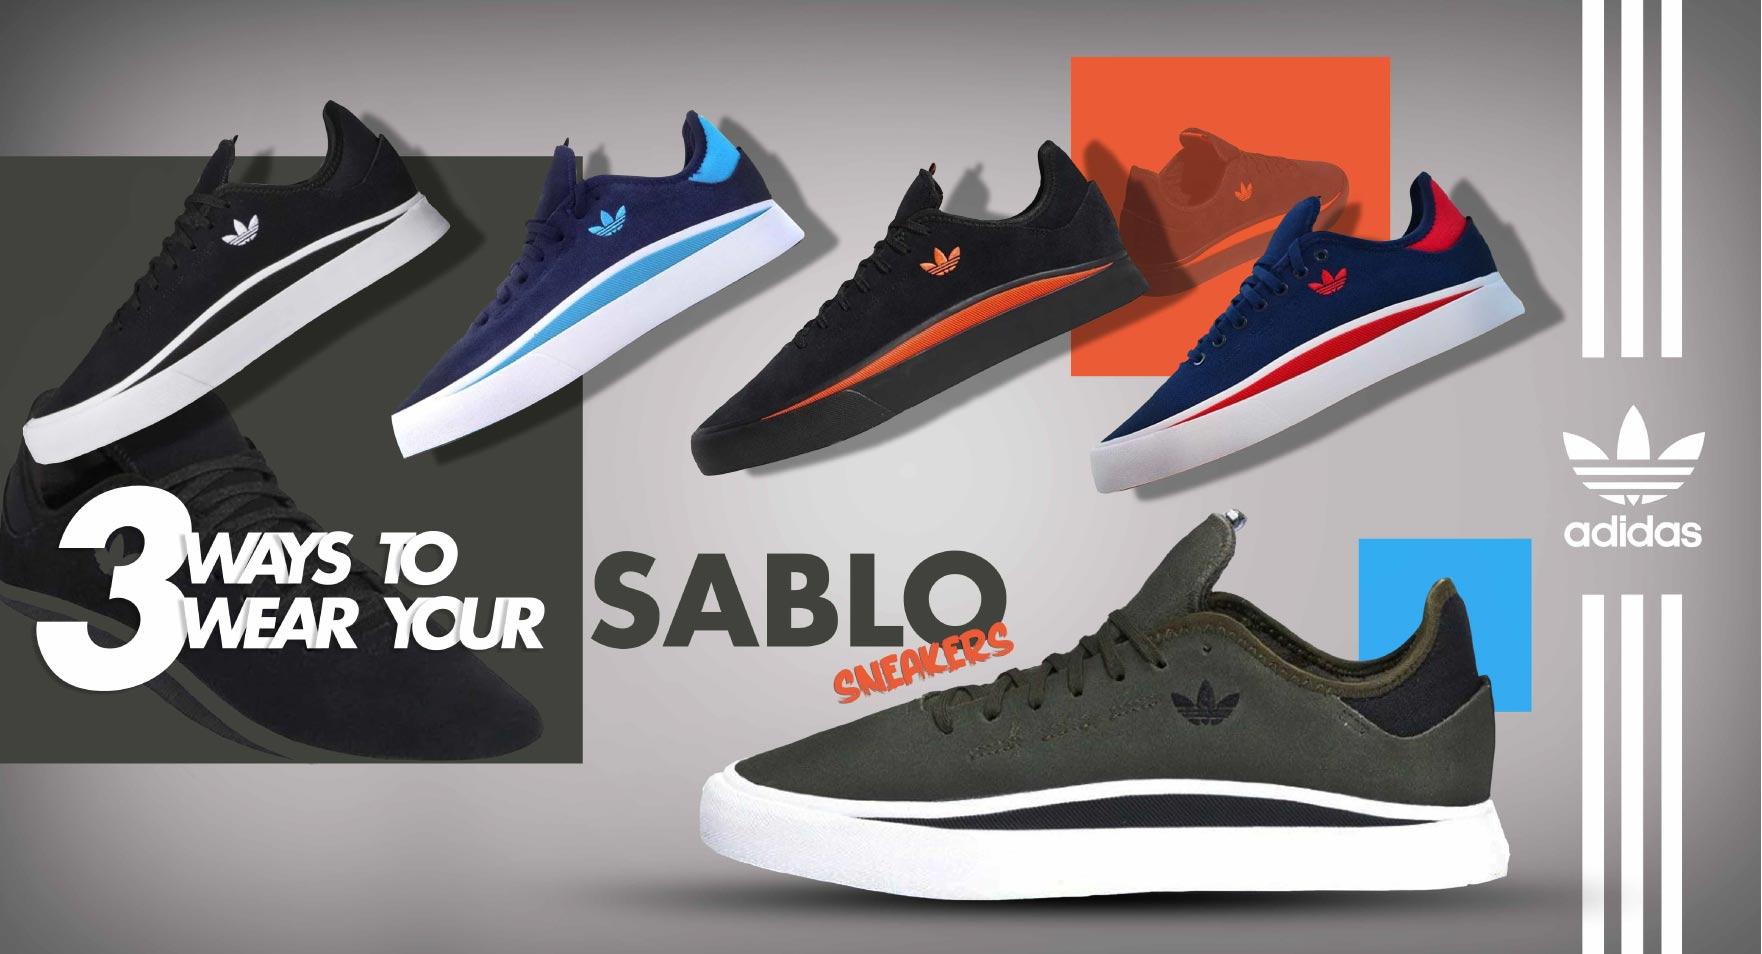 3 Ways to Wear adidas Sabalo Sneakers